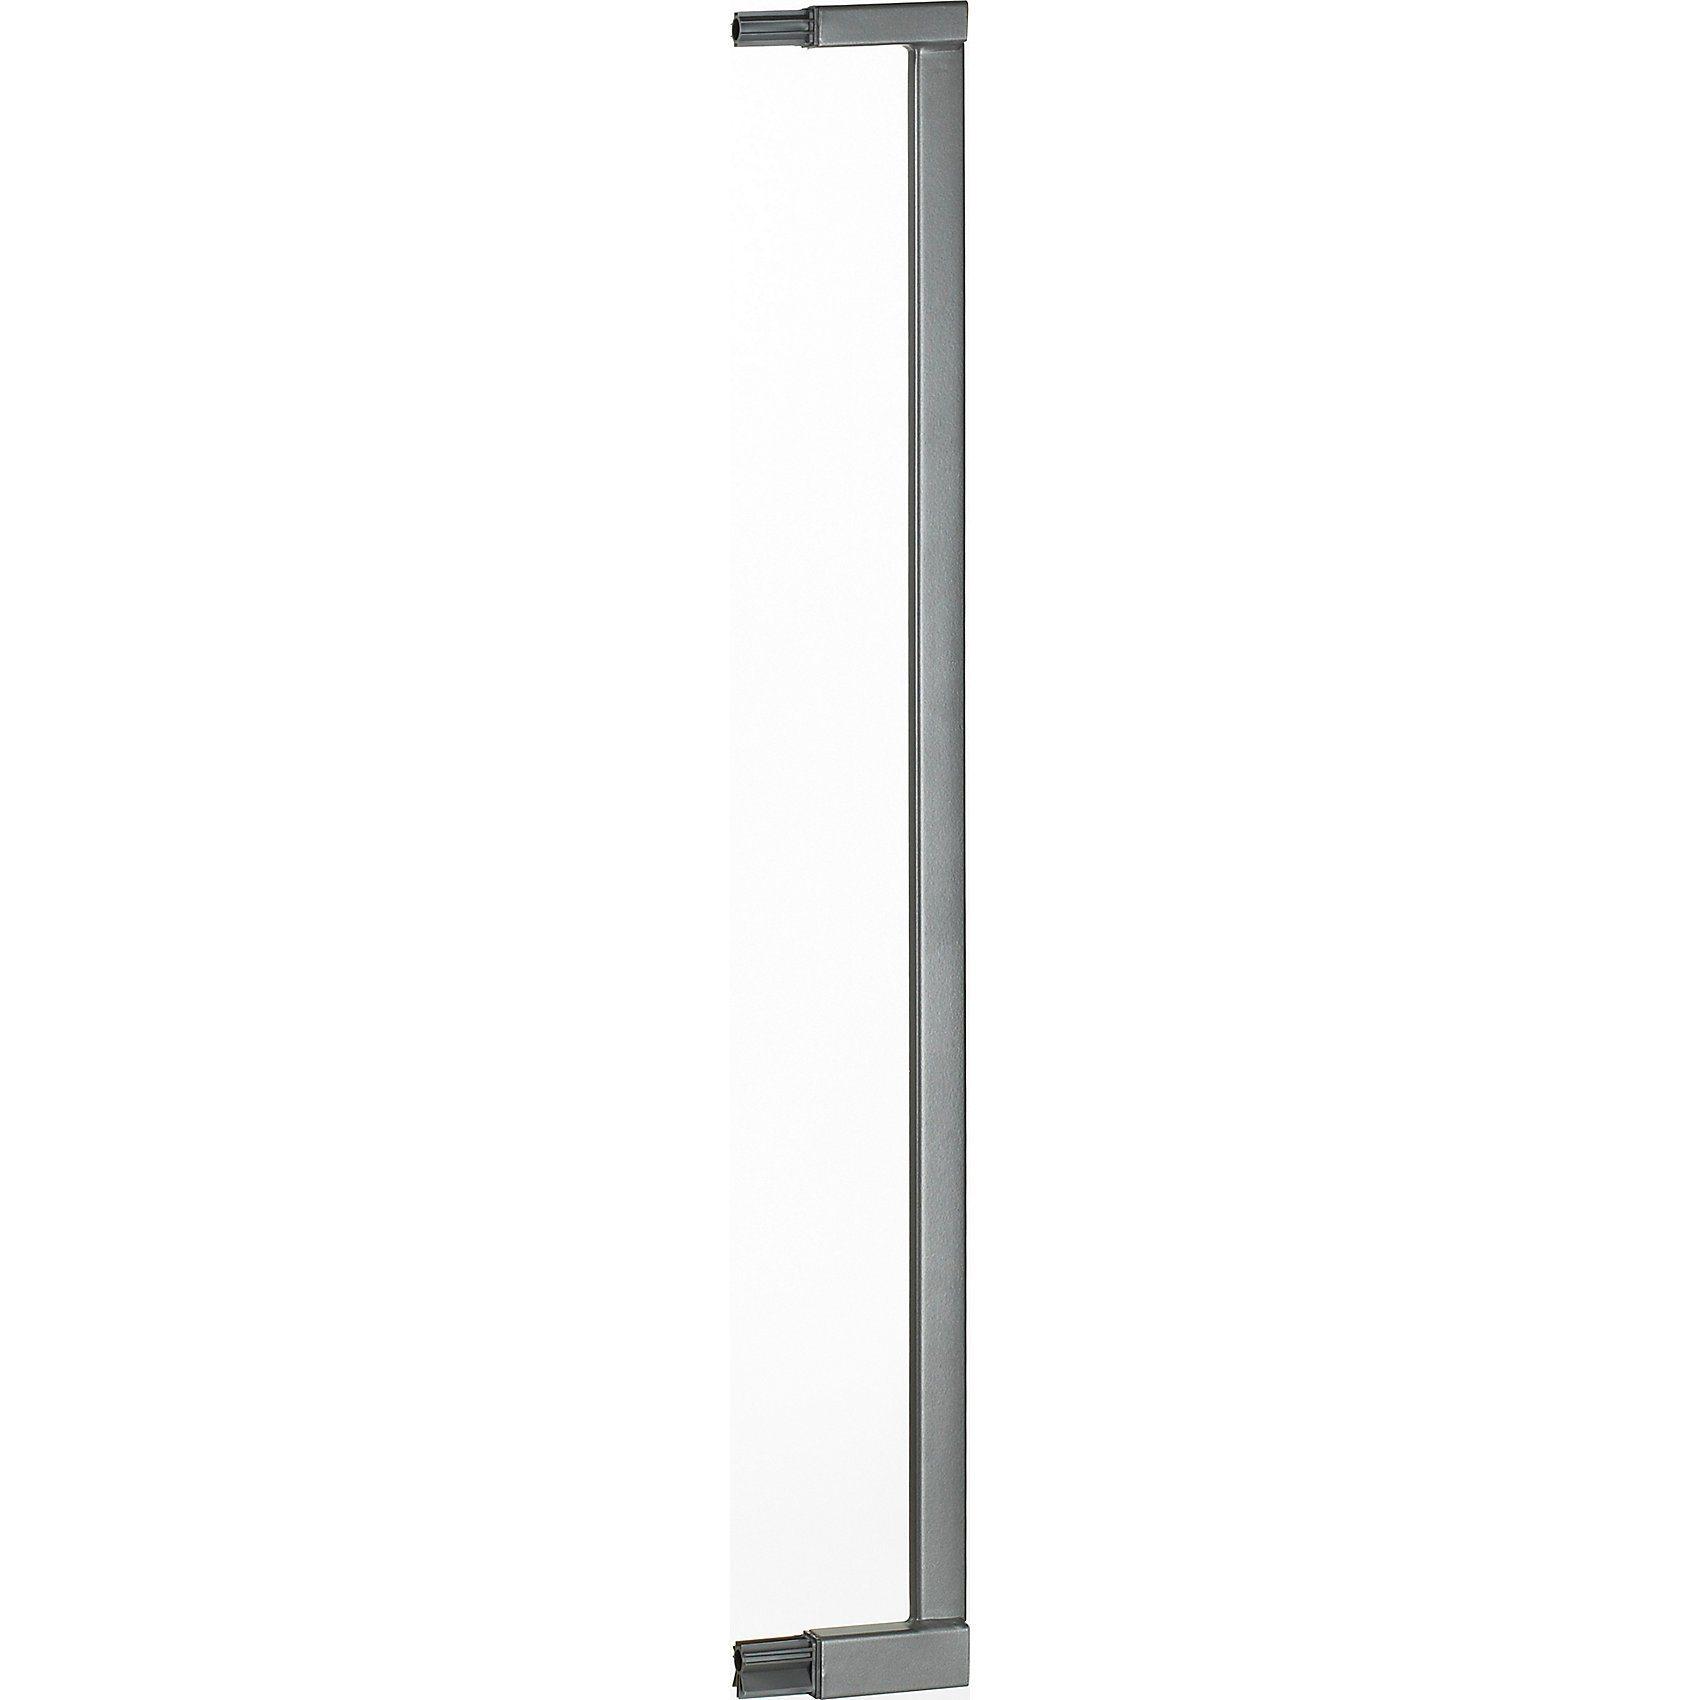 Tr Treppenschutzgitter - Preisvergleich